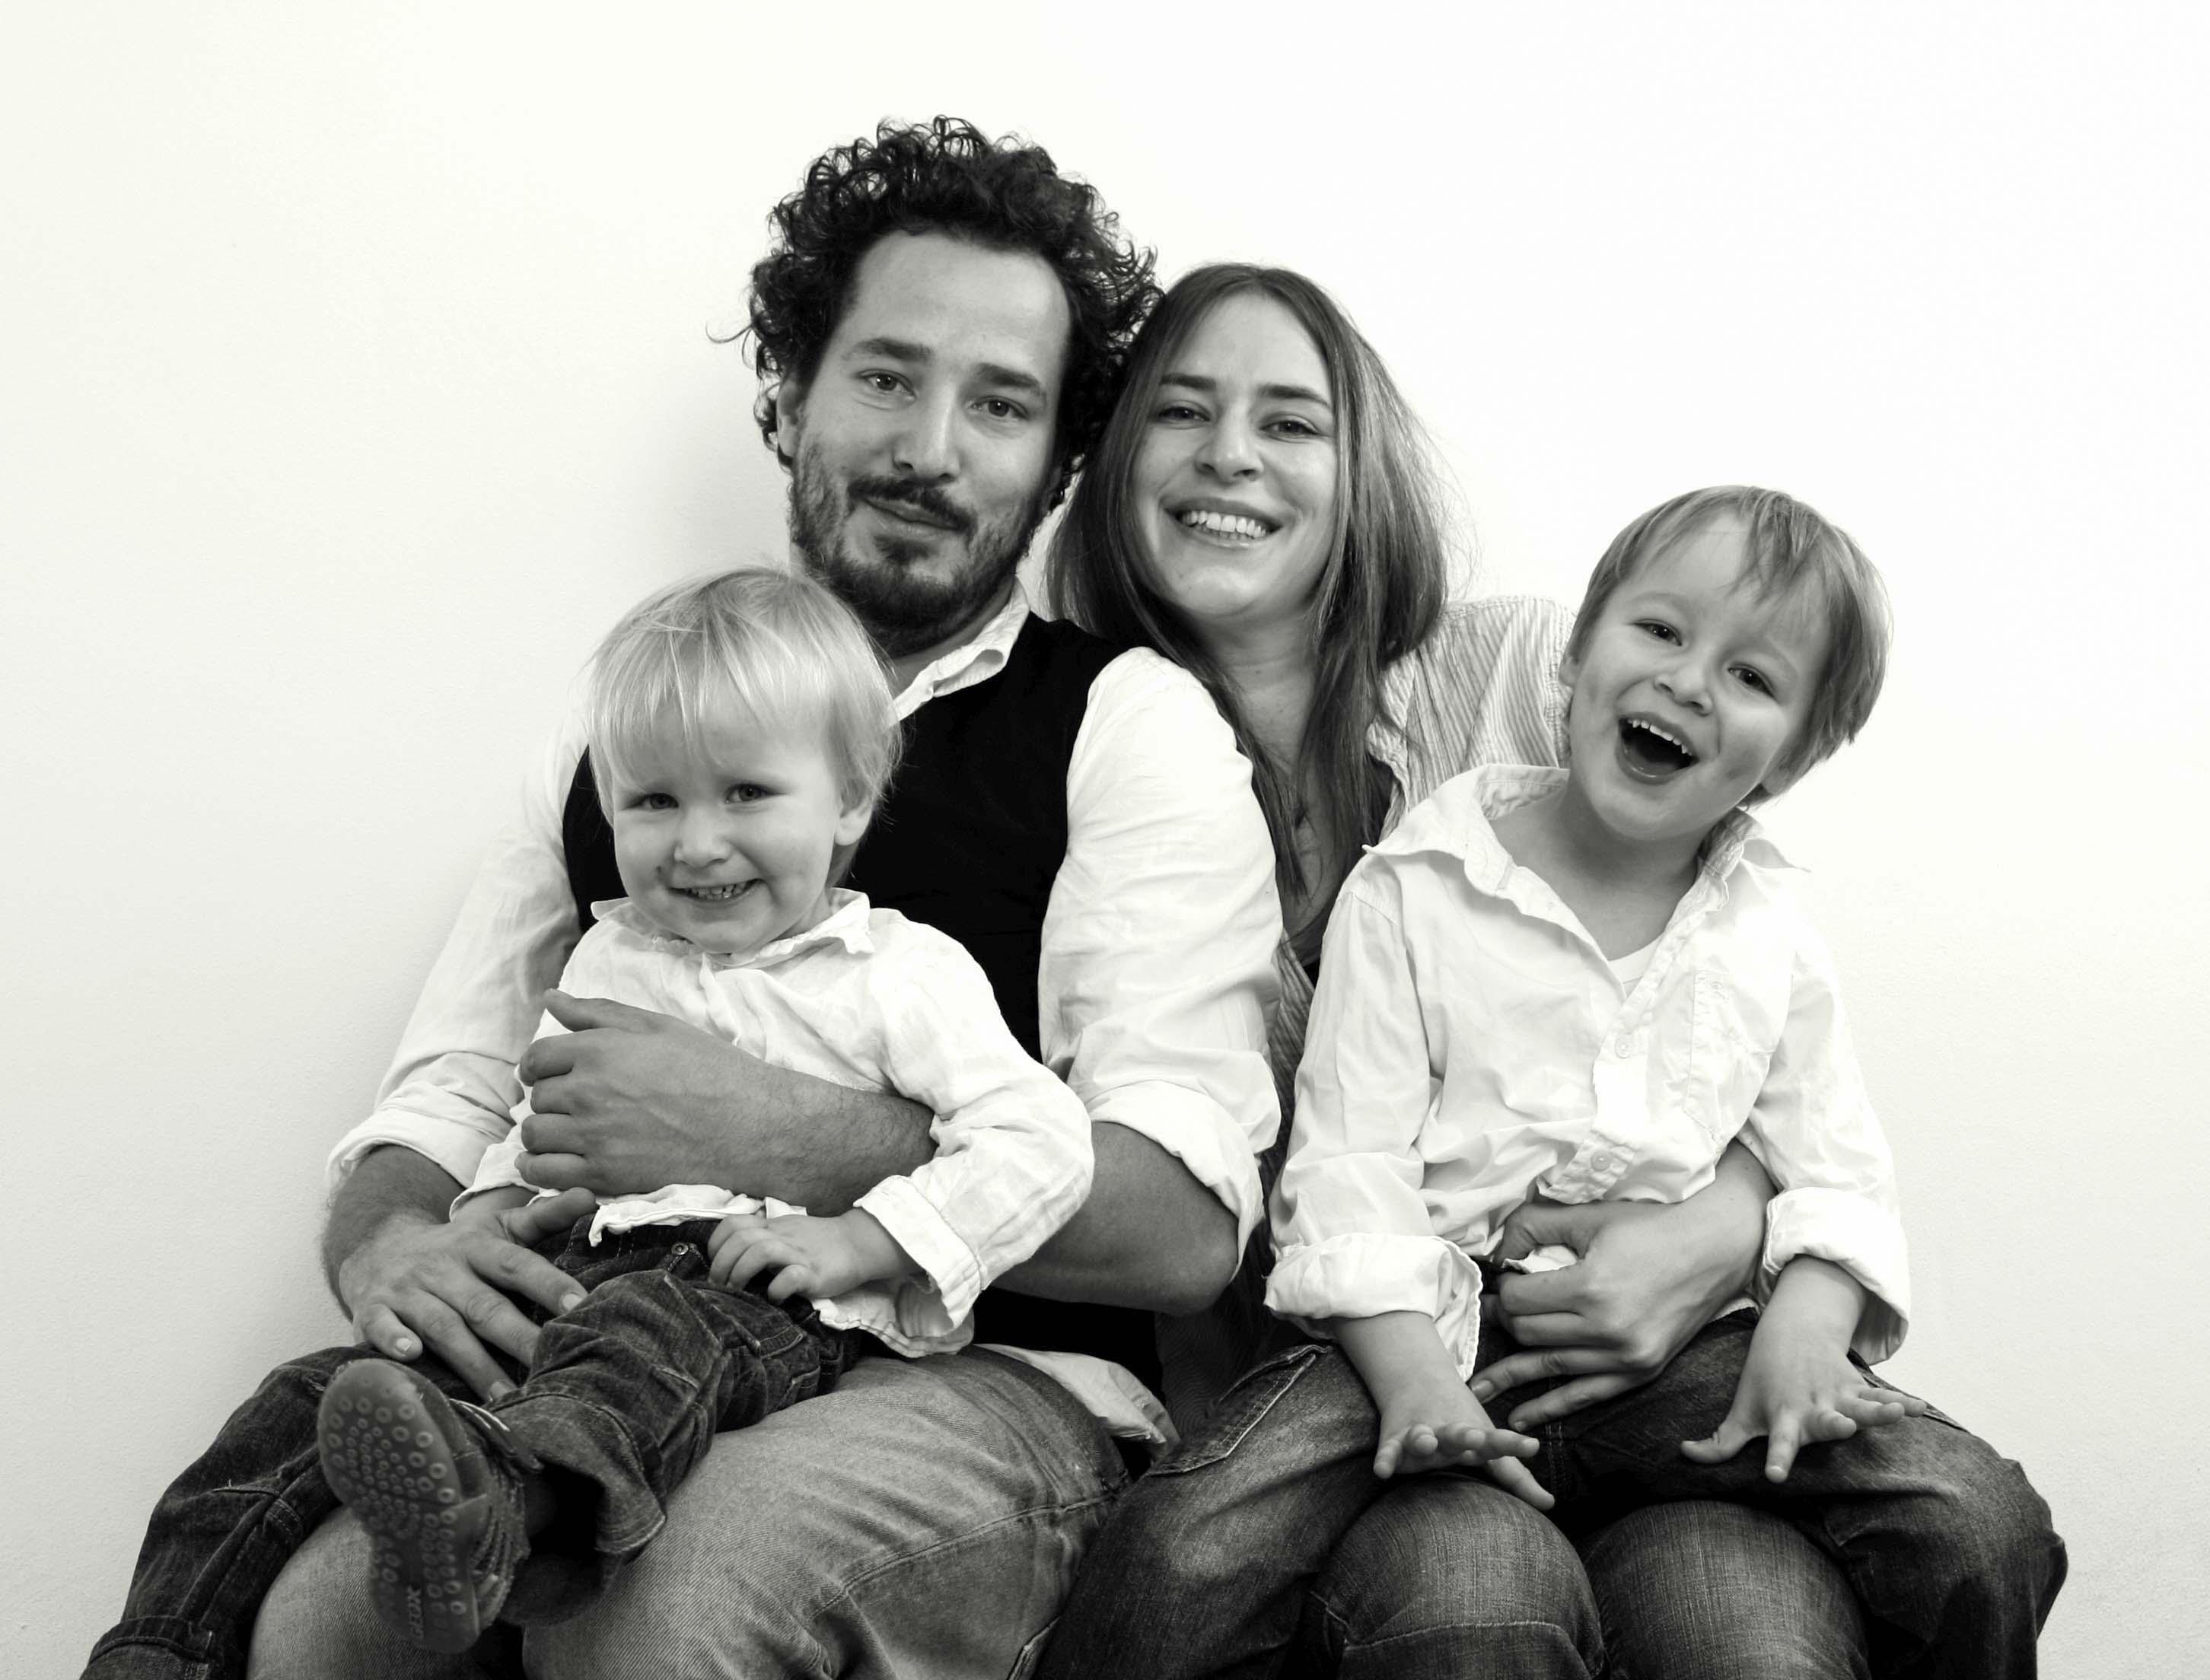 Familienfotos in Muenchen